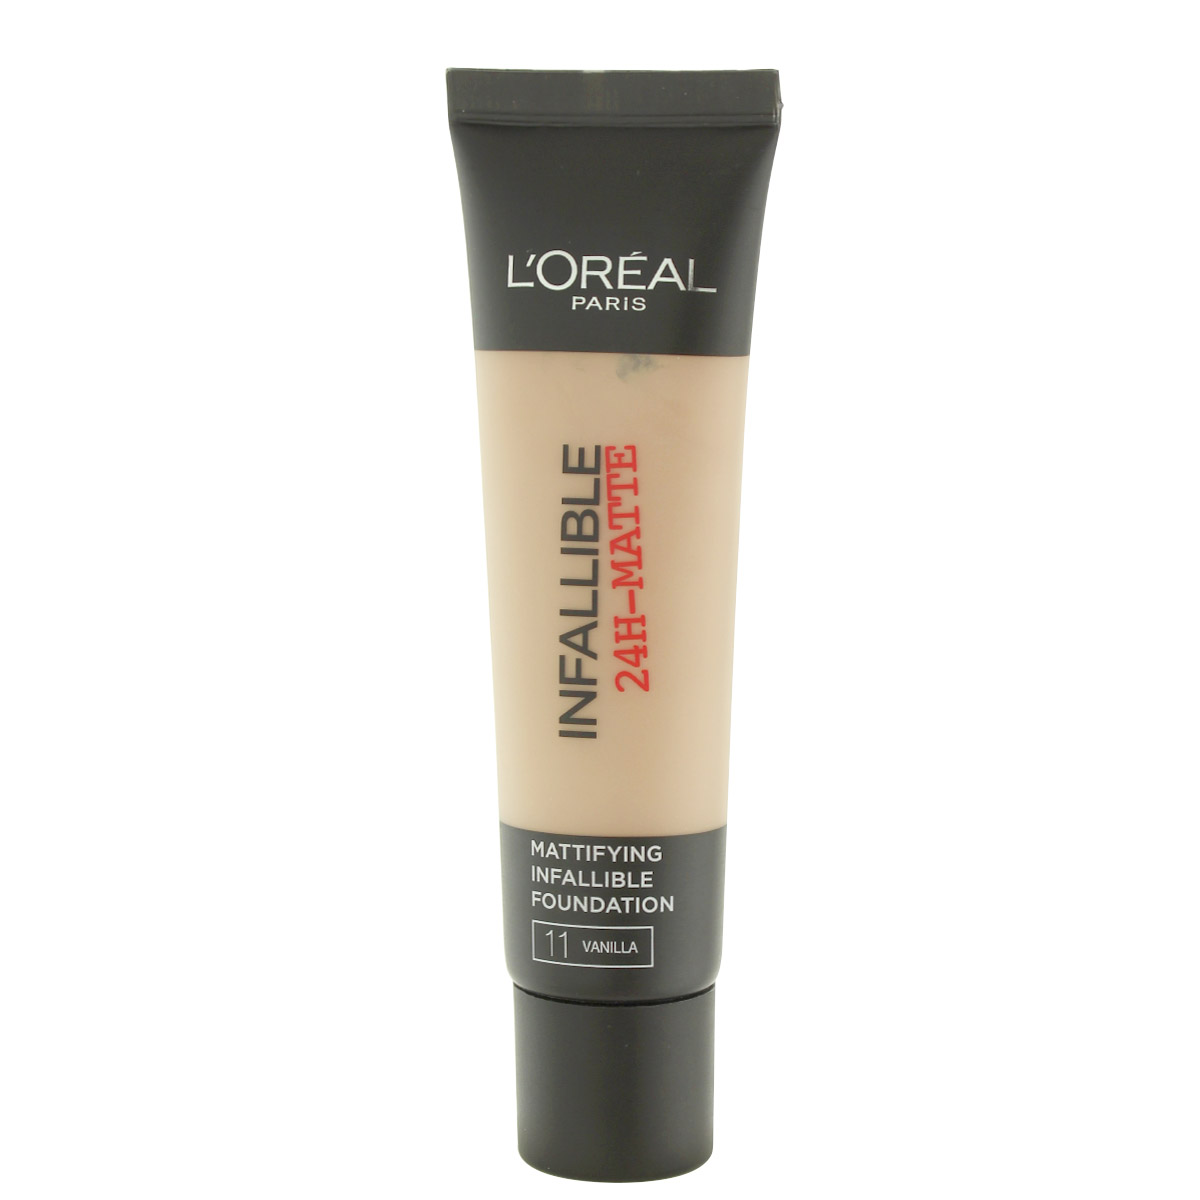 L´Oreal Paris Infallible 24H-Matte make-up (11 Vanilla) 30 ml